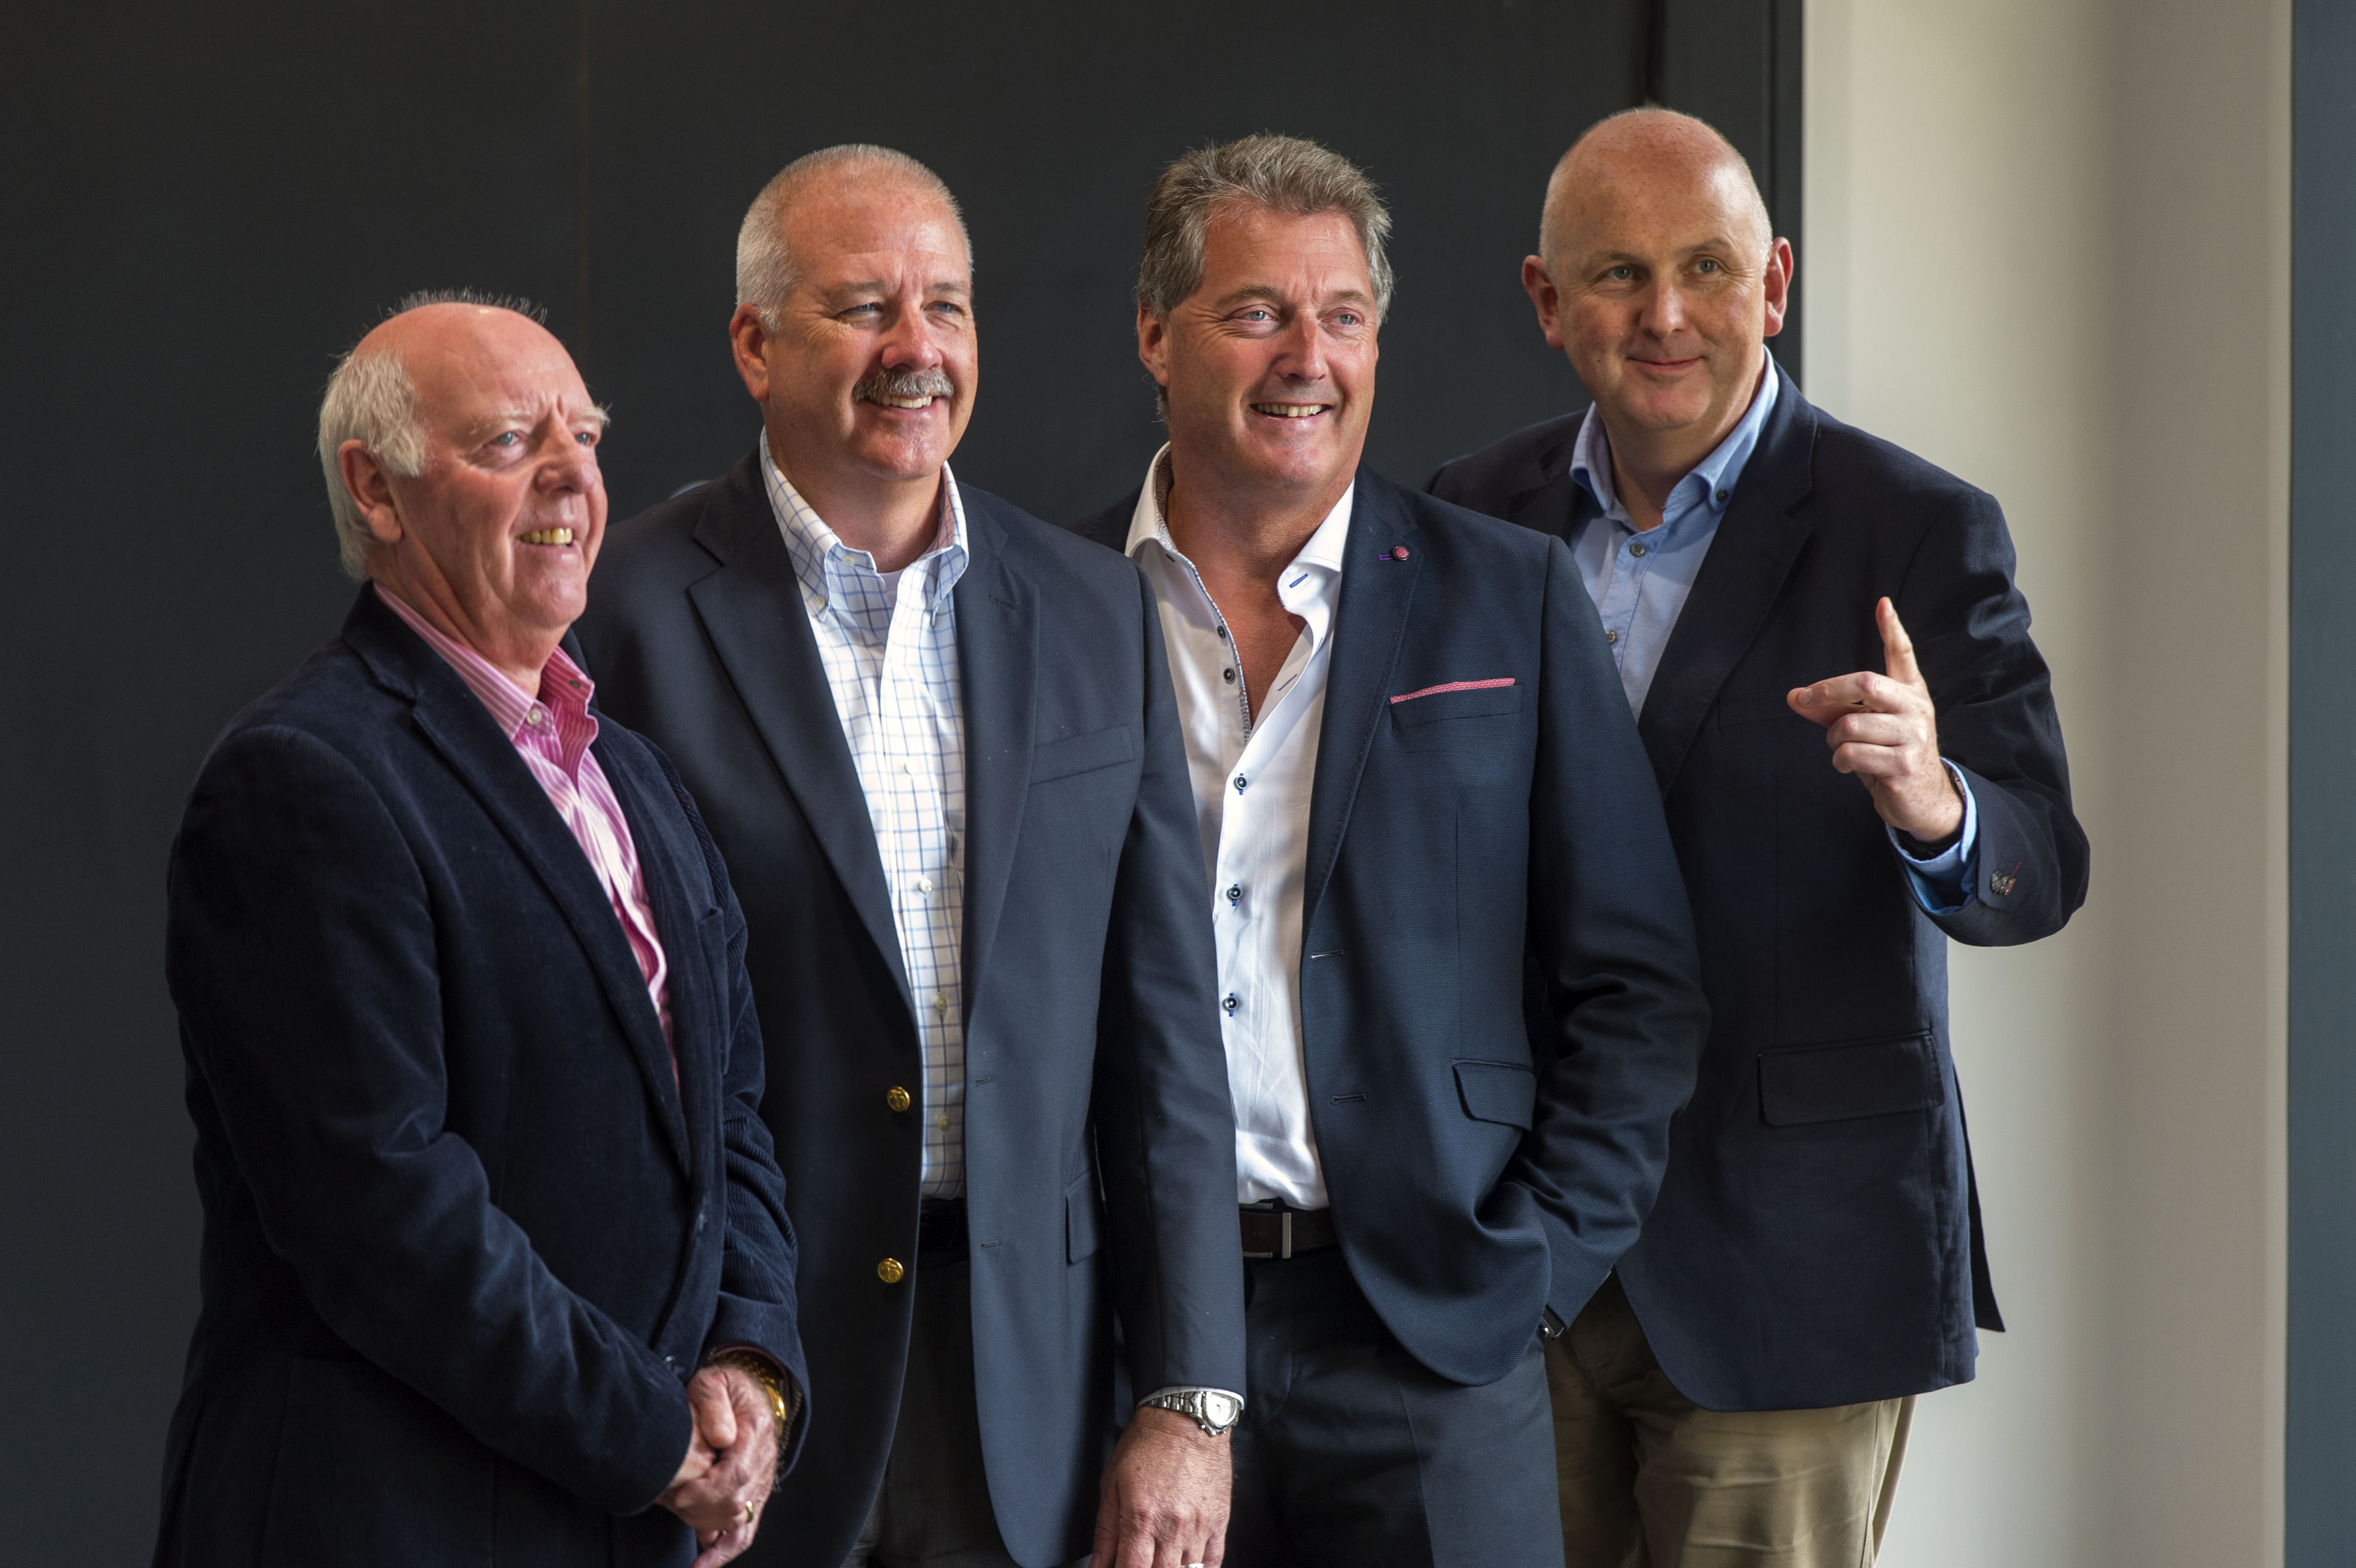 Genesis Team Pic Michael Mac Sweeney/Provision